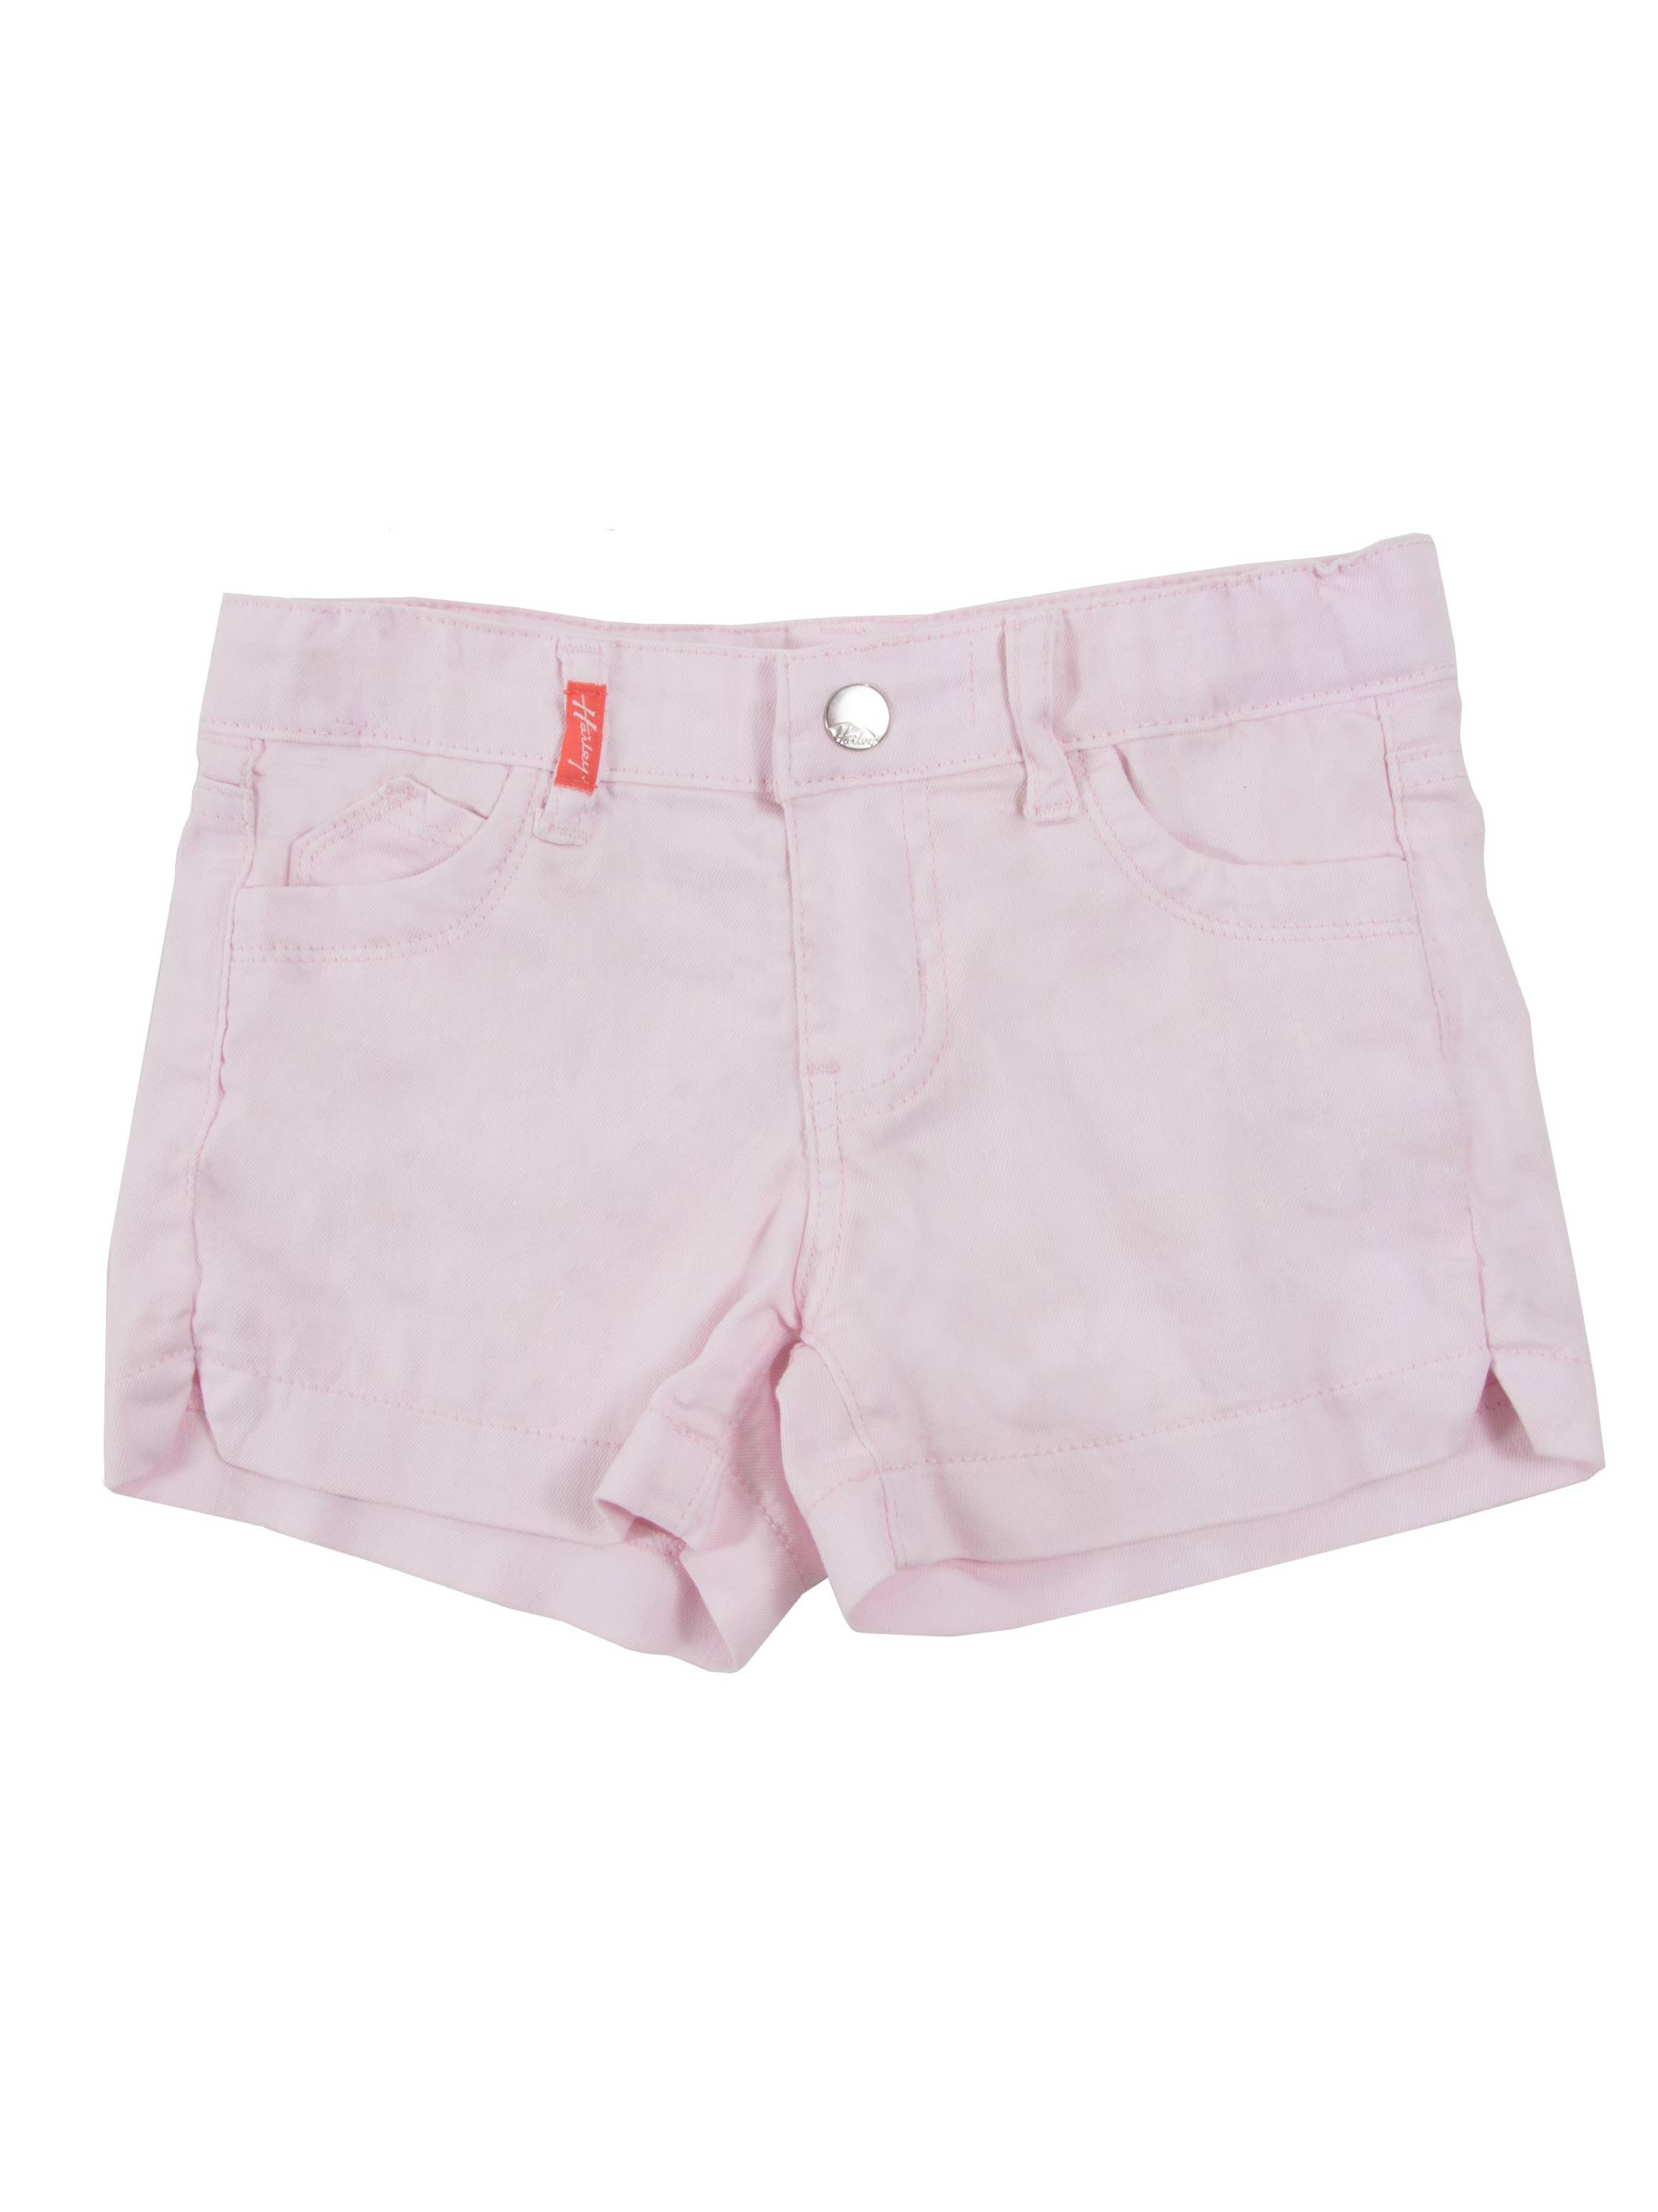 9H049(SH) - Girls Stretch 5 Pockets, Color Premium Denim Shorts